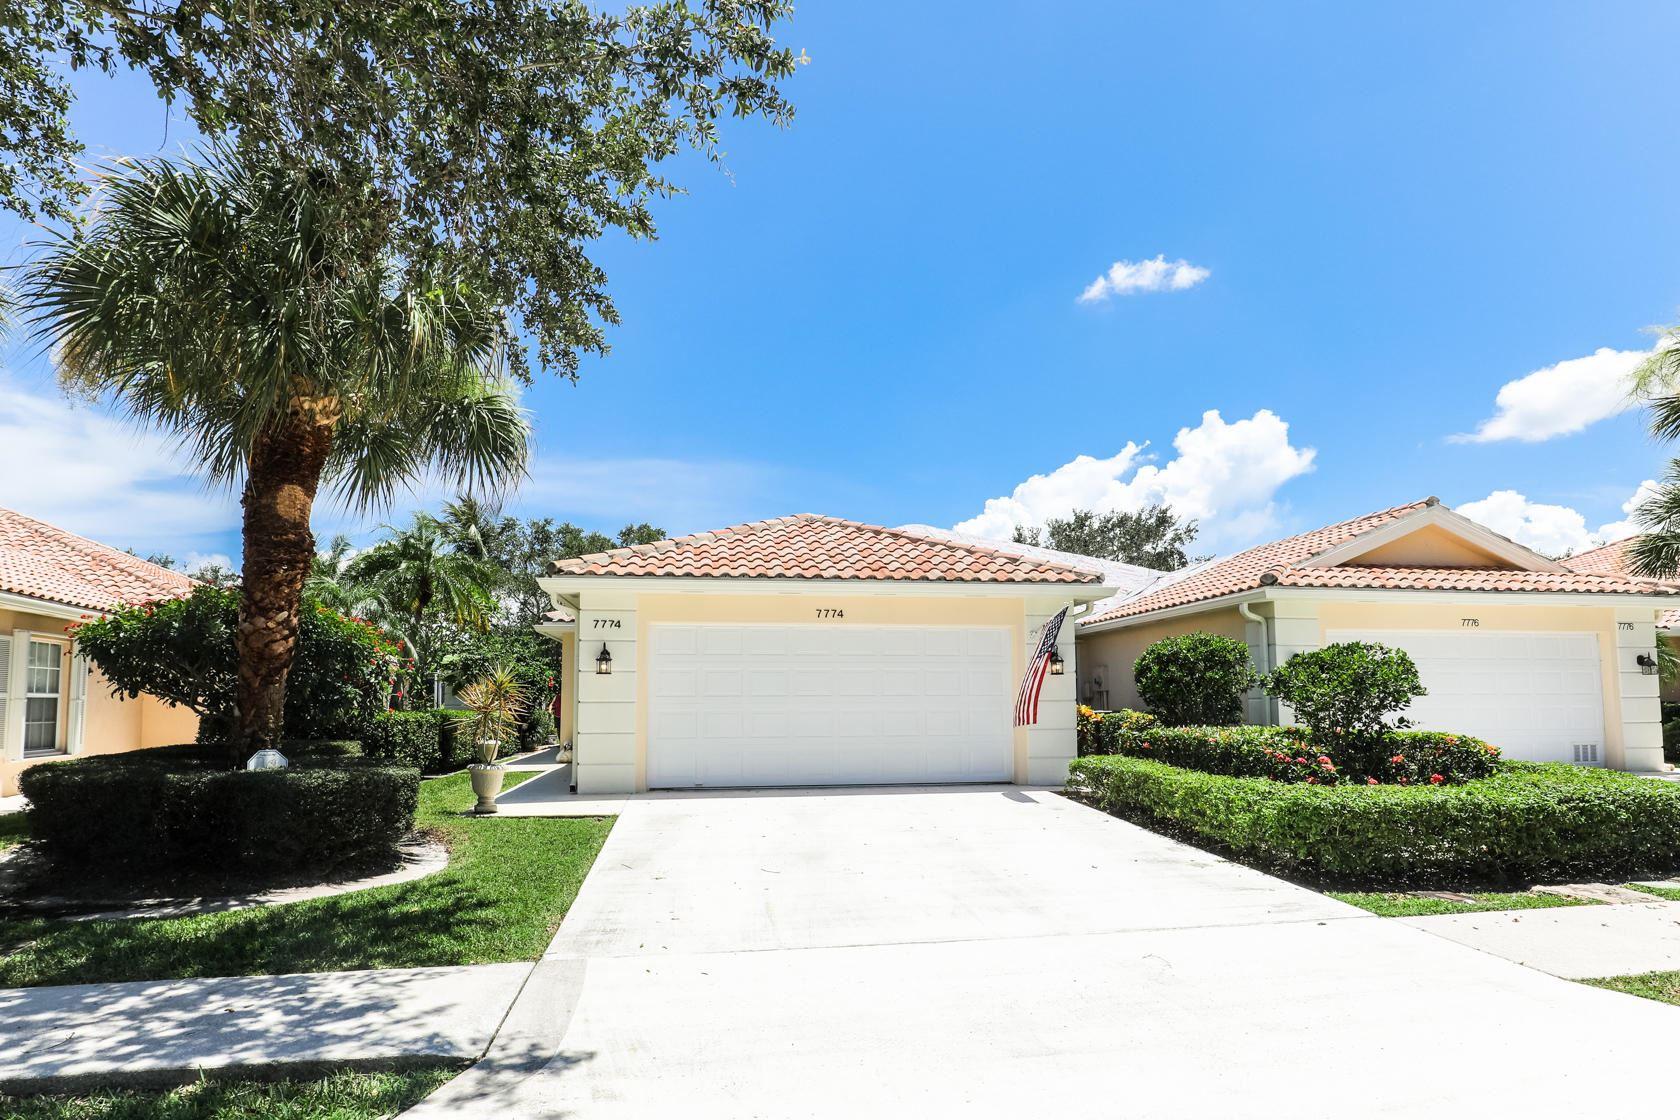 7774 Nile River Road, West Palm Beach, FL 33411 - MLS#: RX-10734954